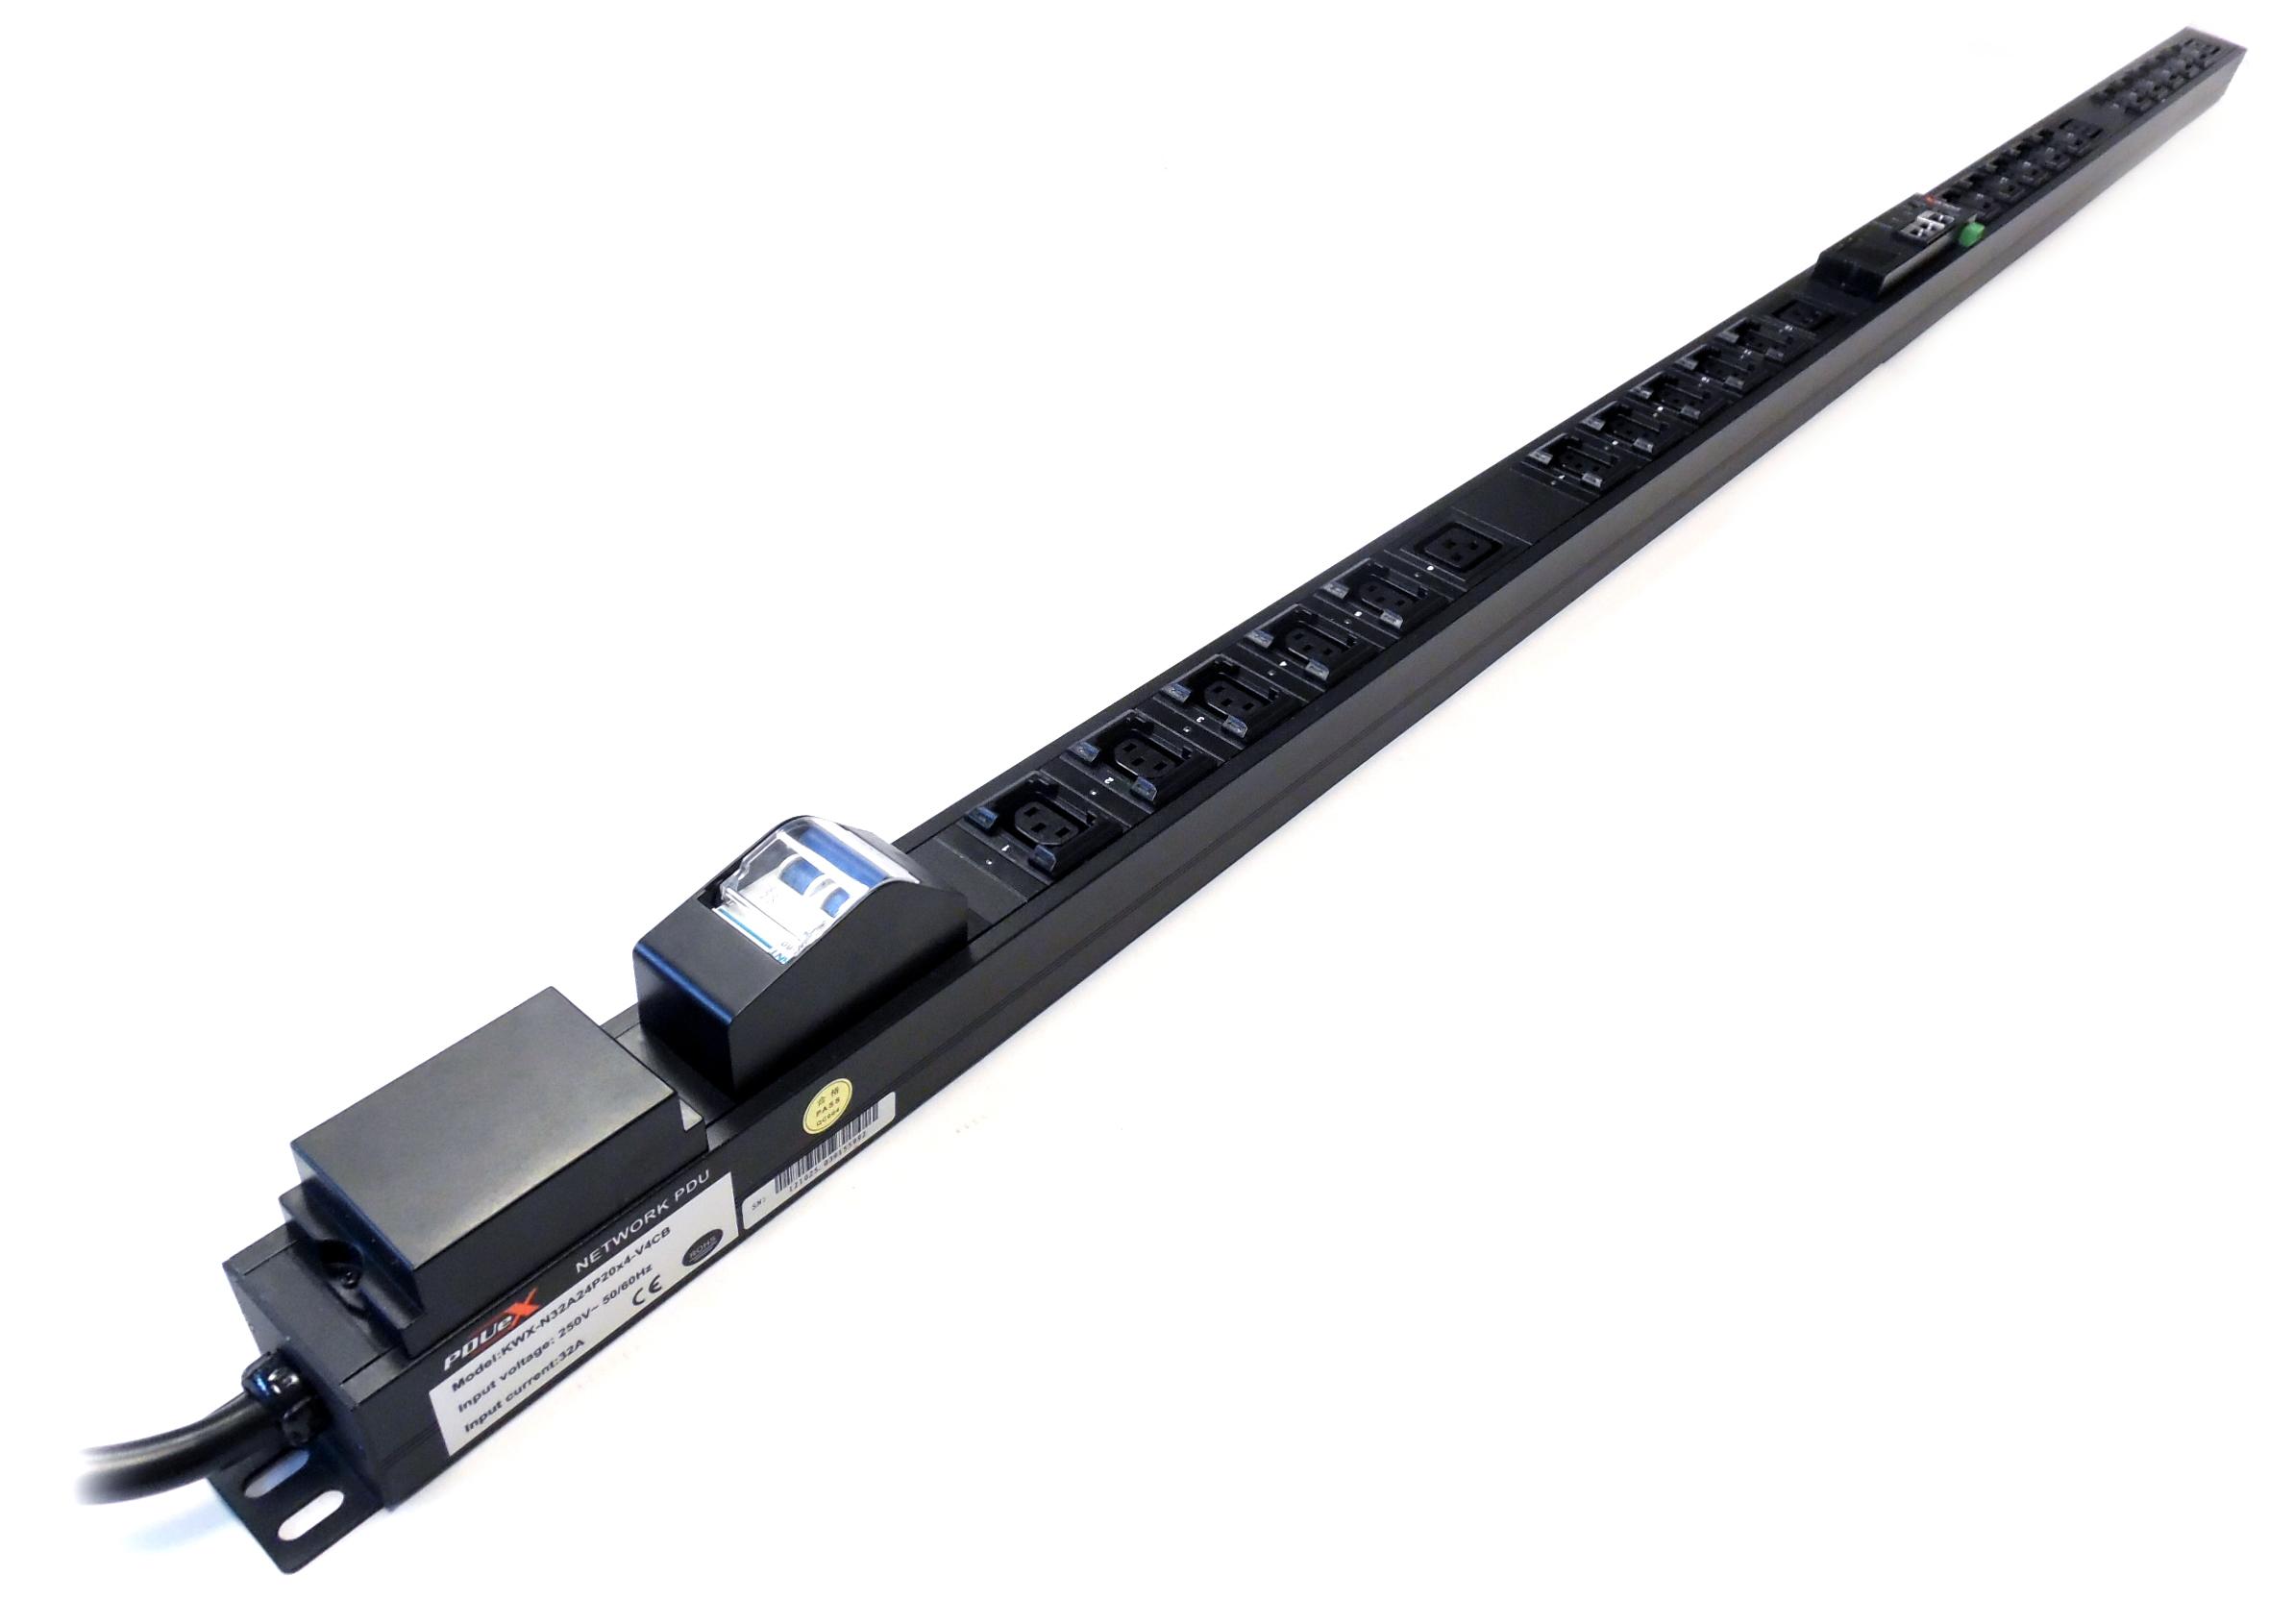 0U Rack Mountable PDU - Per Outlet Switching